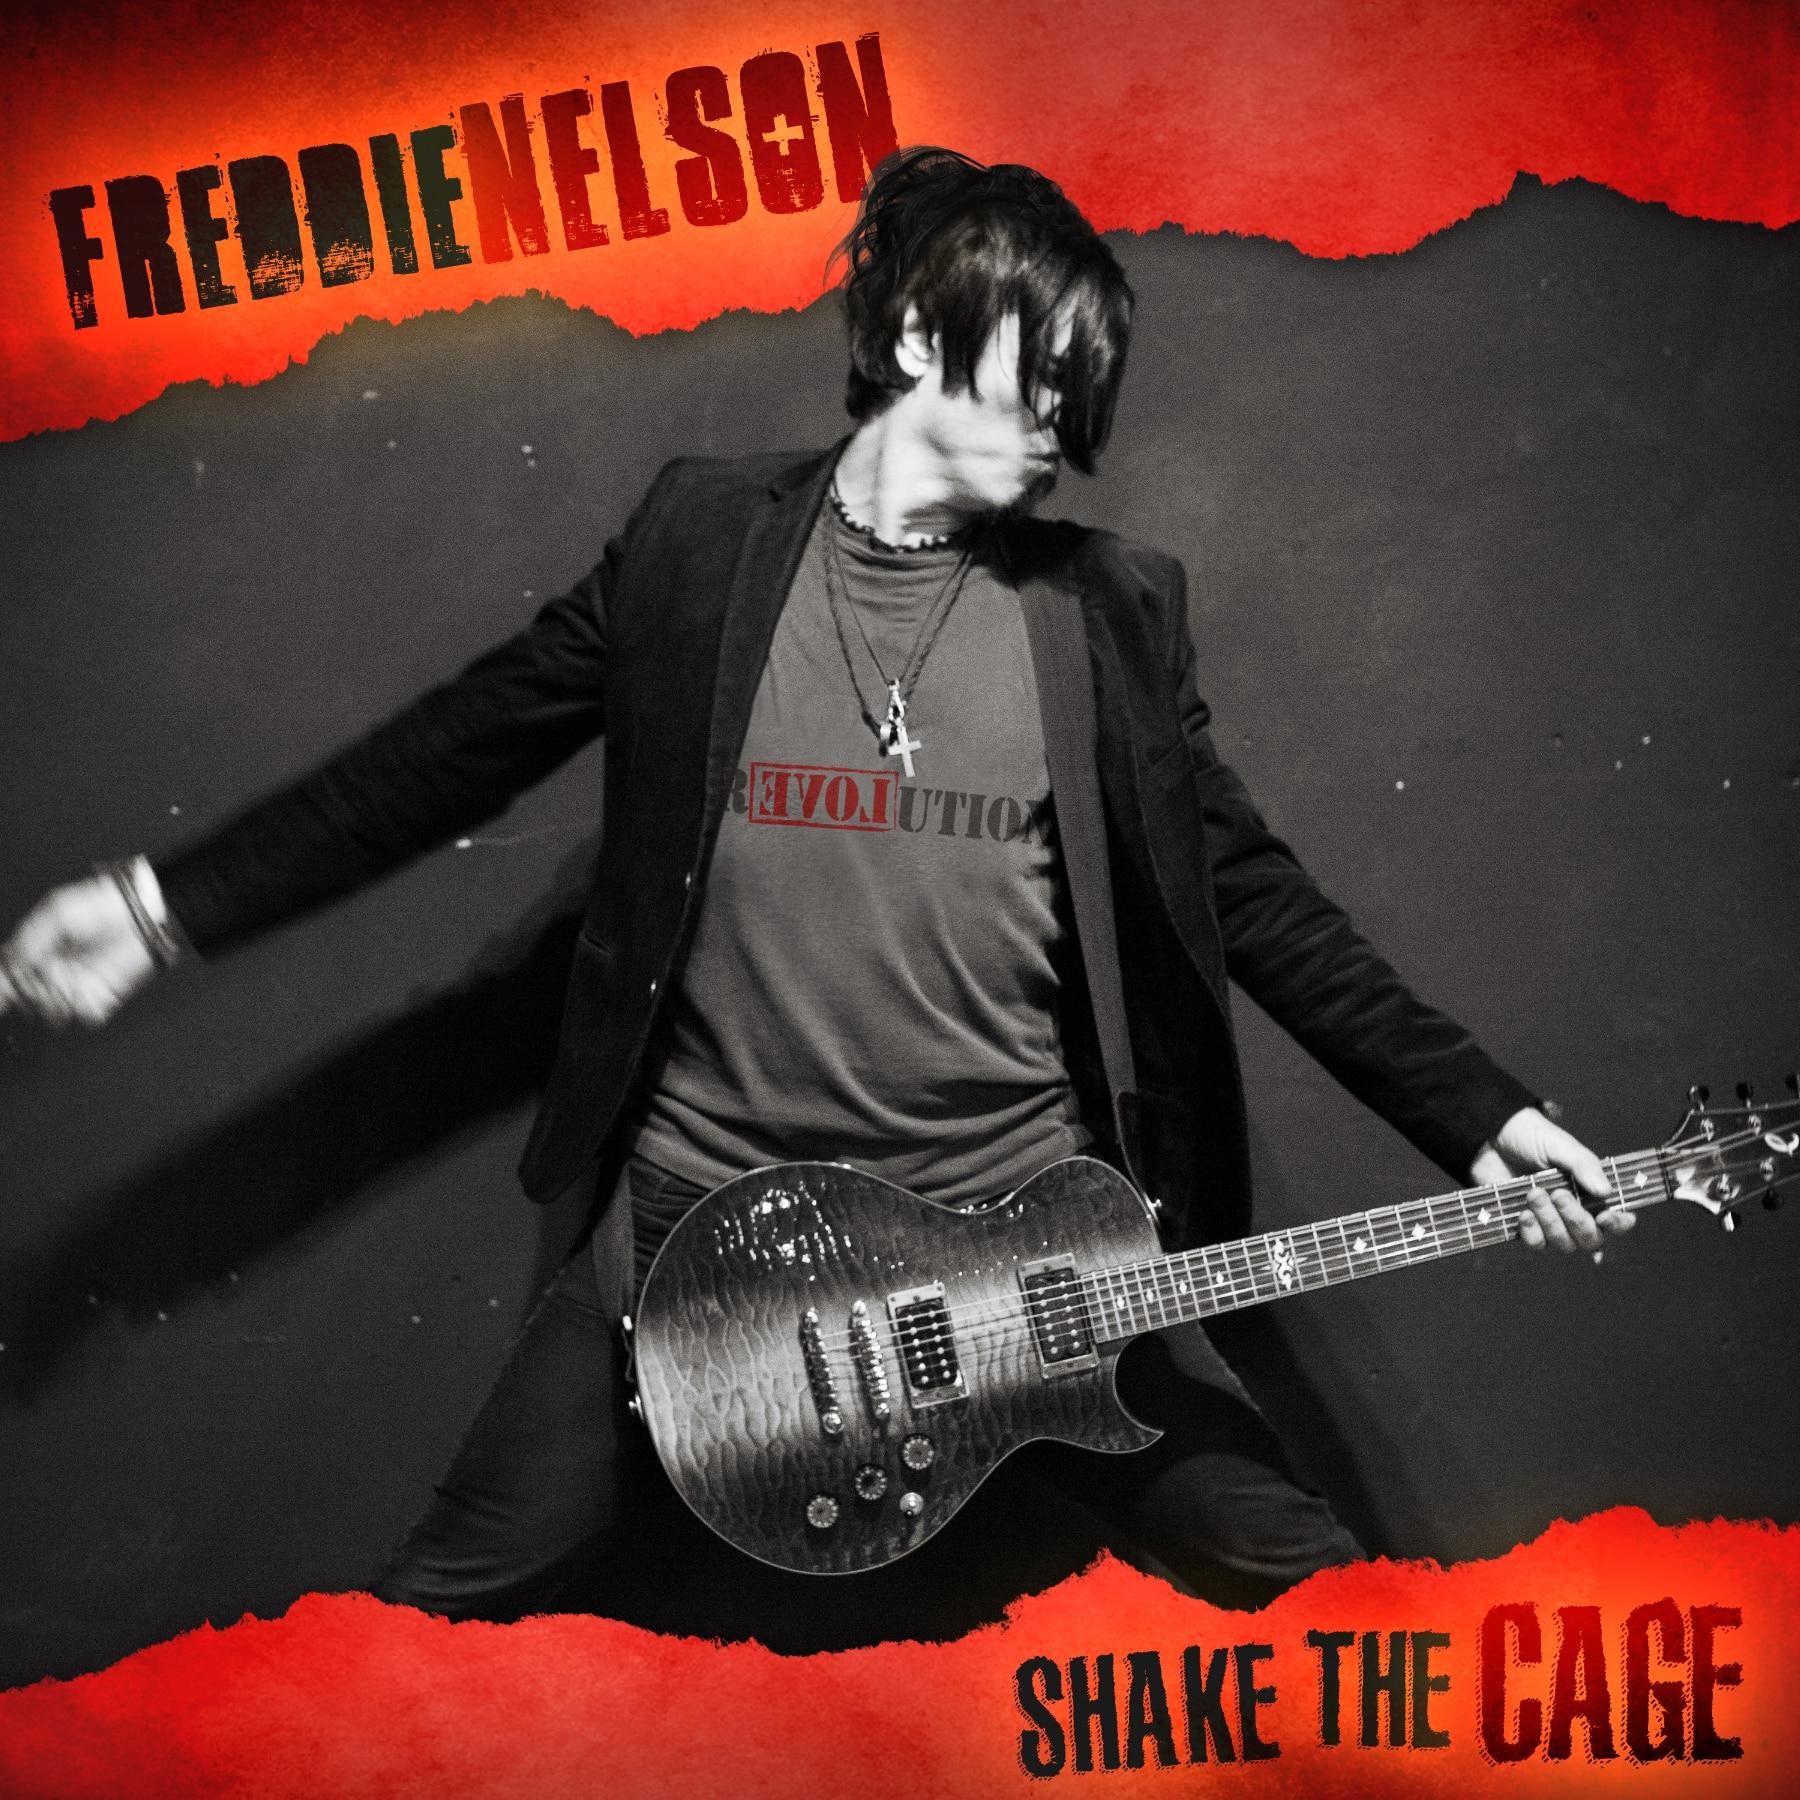 Freddie Nelson